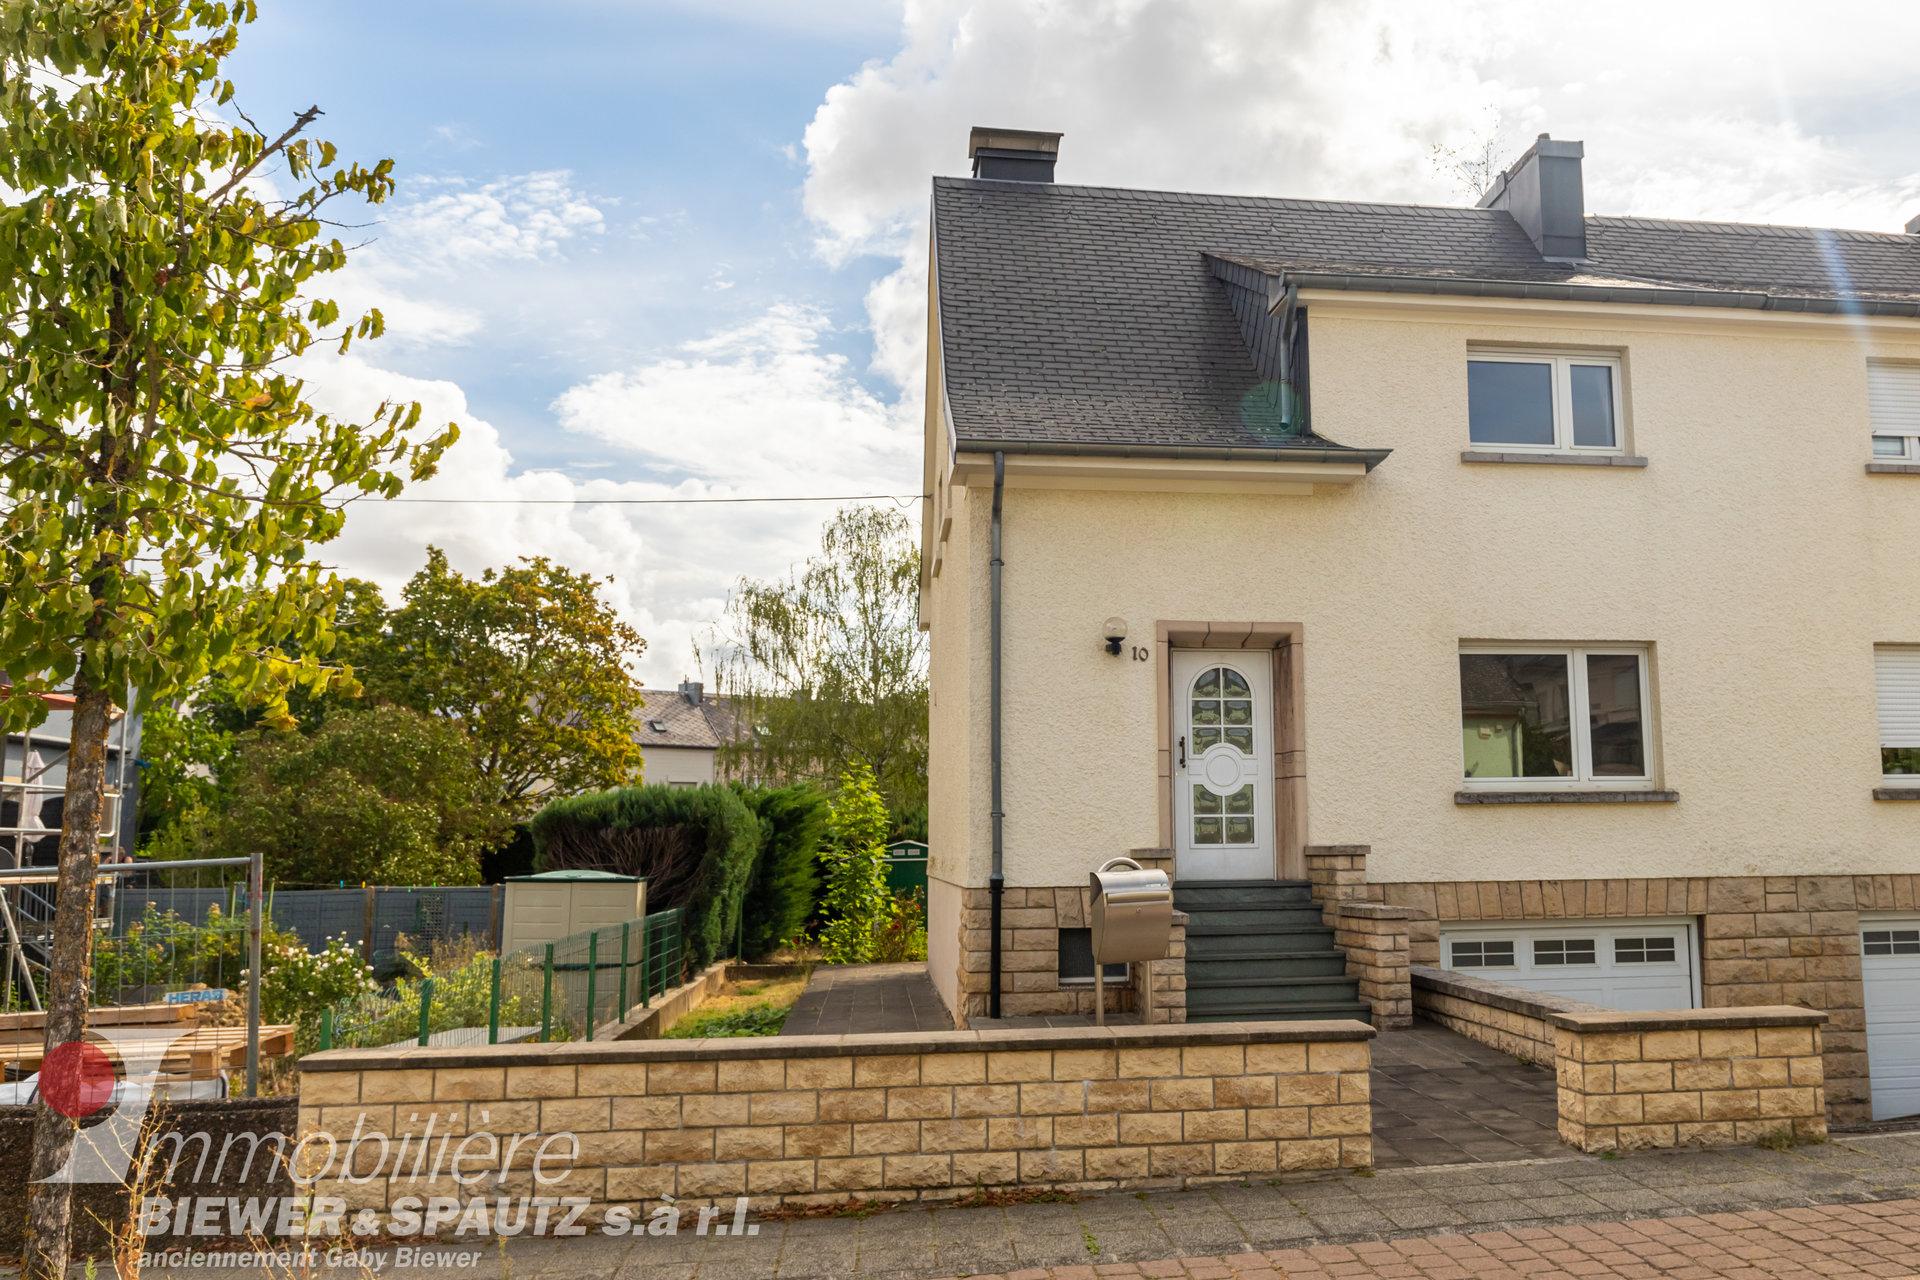 UNDER SALES AGREEMENT - semi-detached house with 2 bedrooms in Esch-sur-Alzette